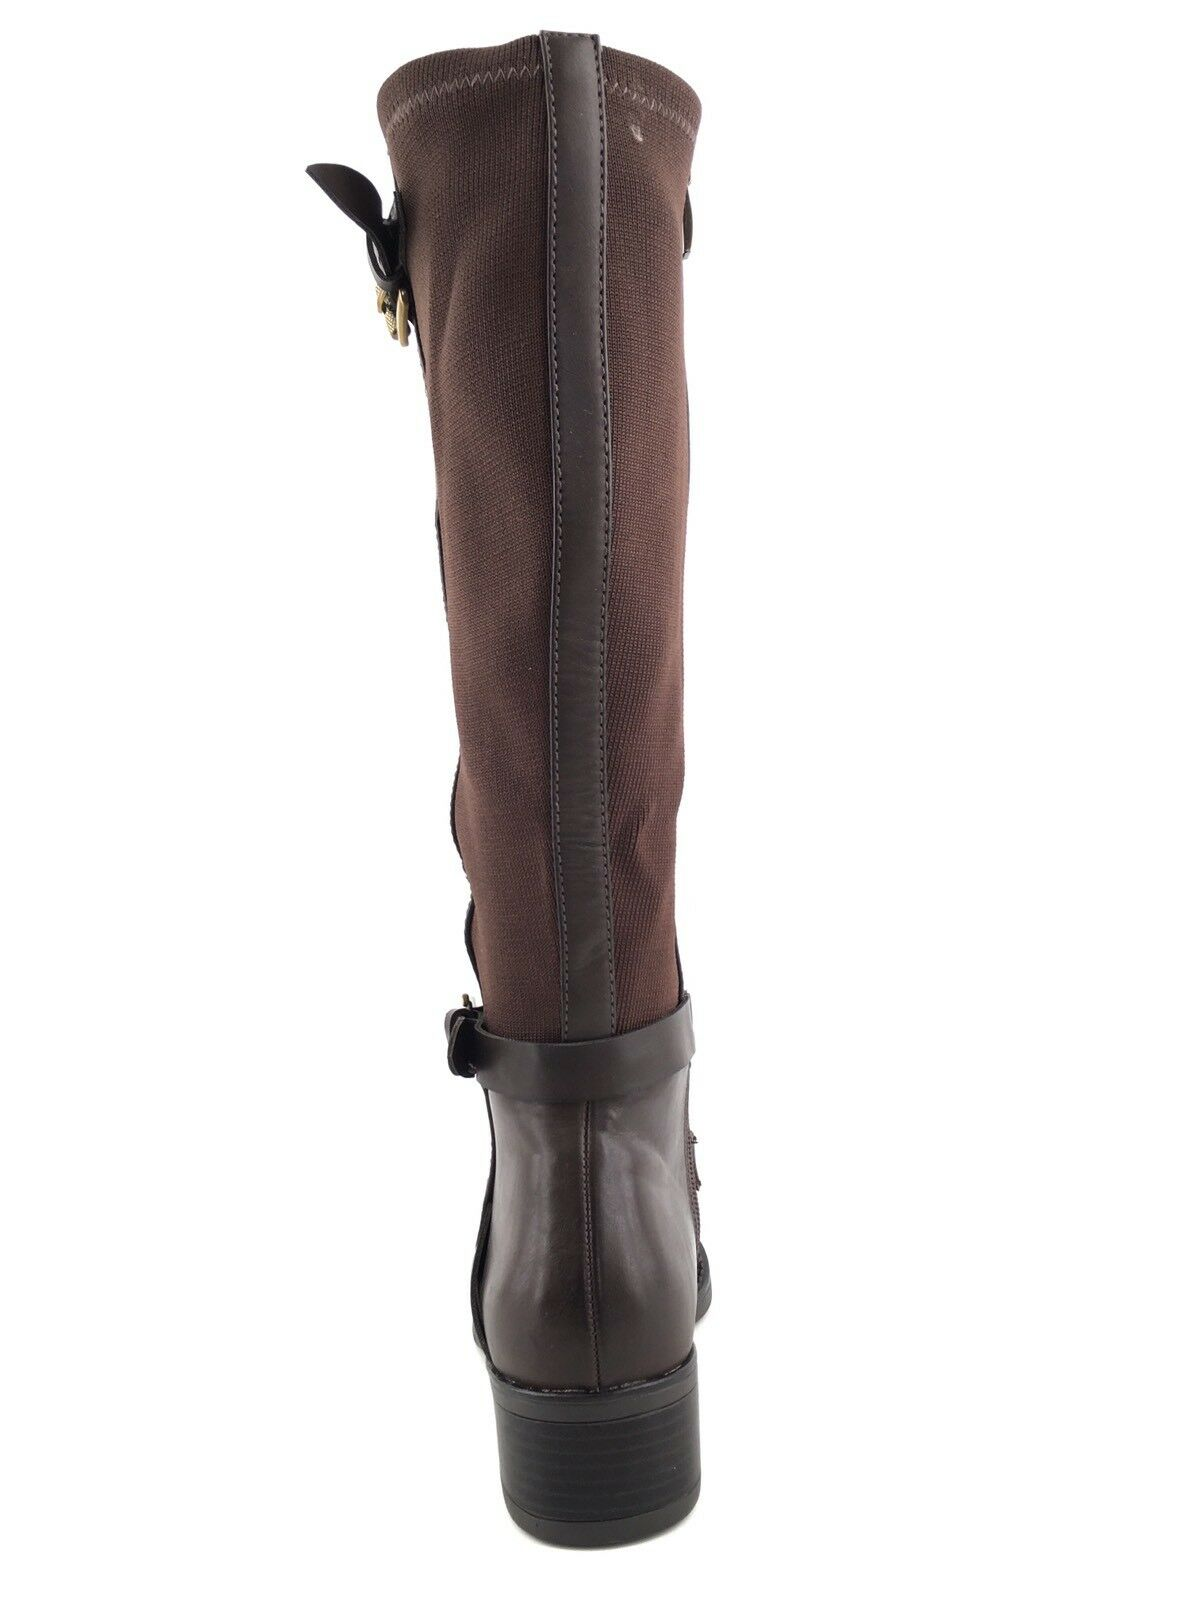 Franco Sarto damen Chrome braun Knee Knee Knee High Leather Knit Stiefel Größe 5.5 M  cbb20a